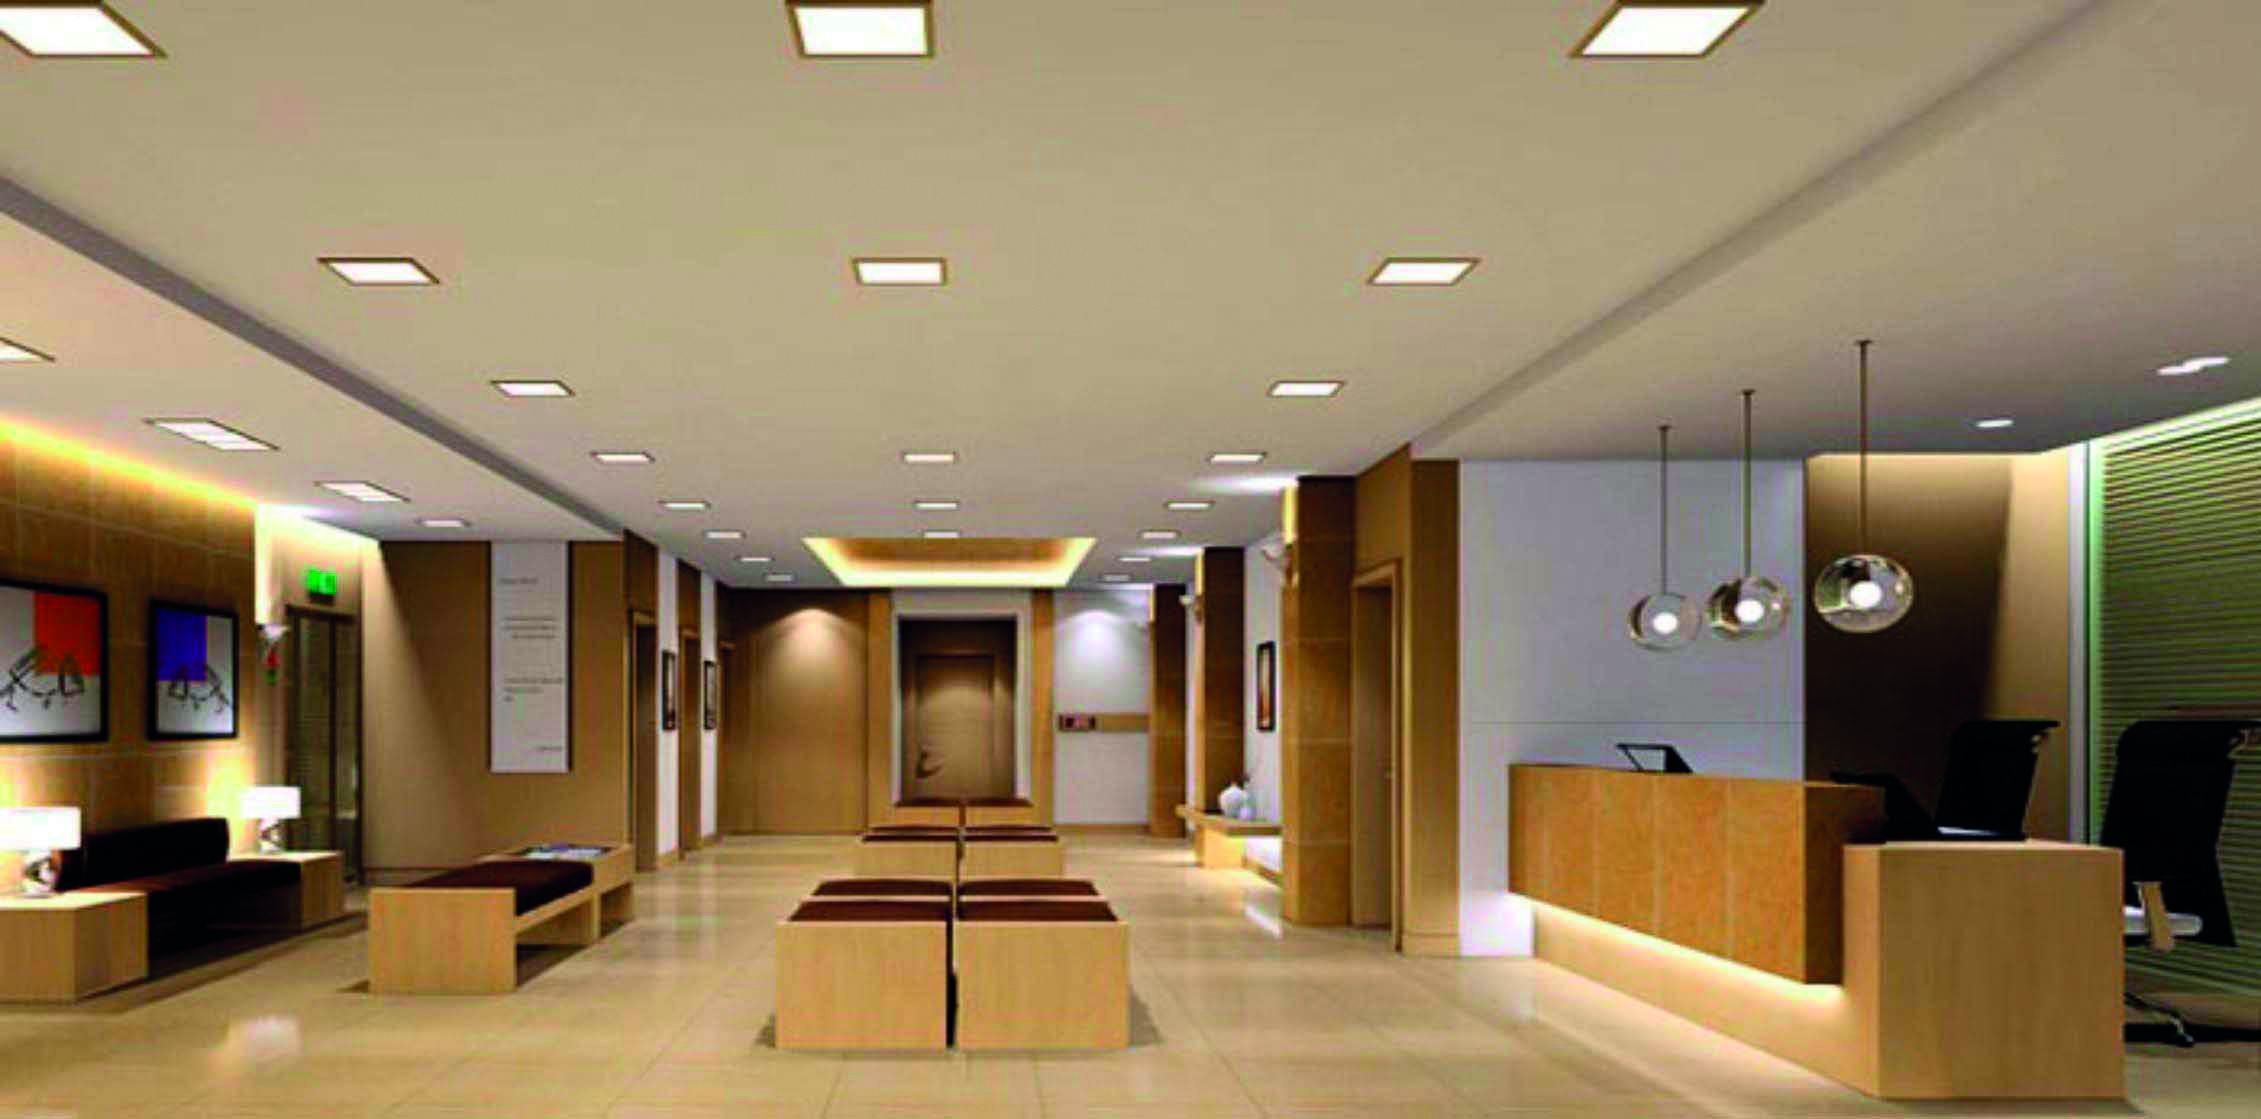 Panel LED Cuadrado Embutido 12W